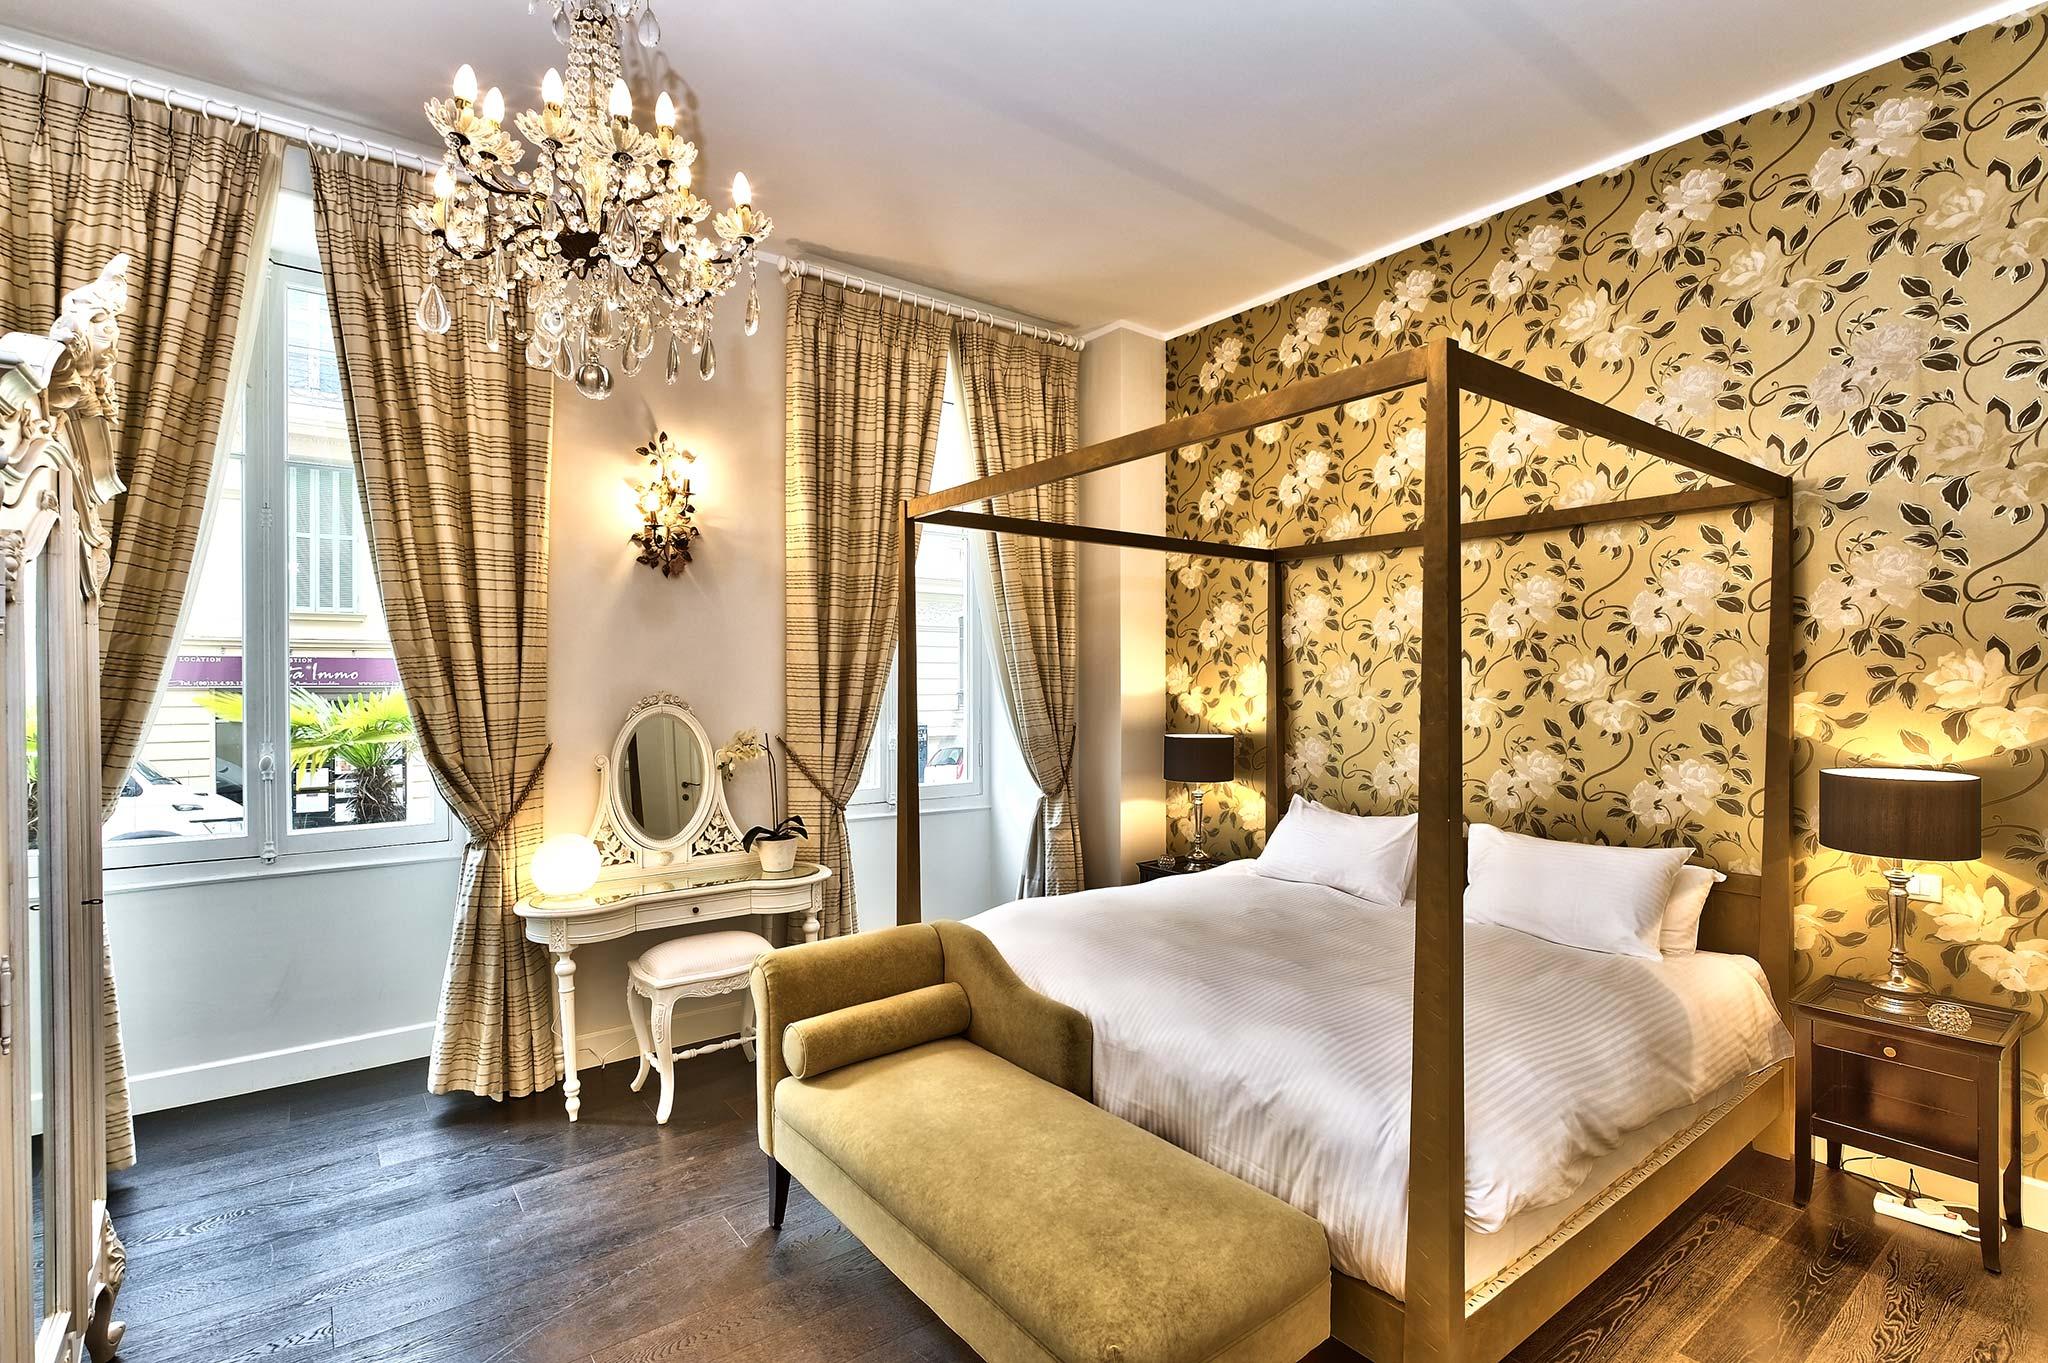 perfect bedroom lighing callender howorth